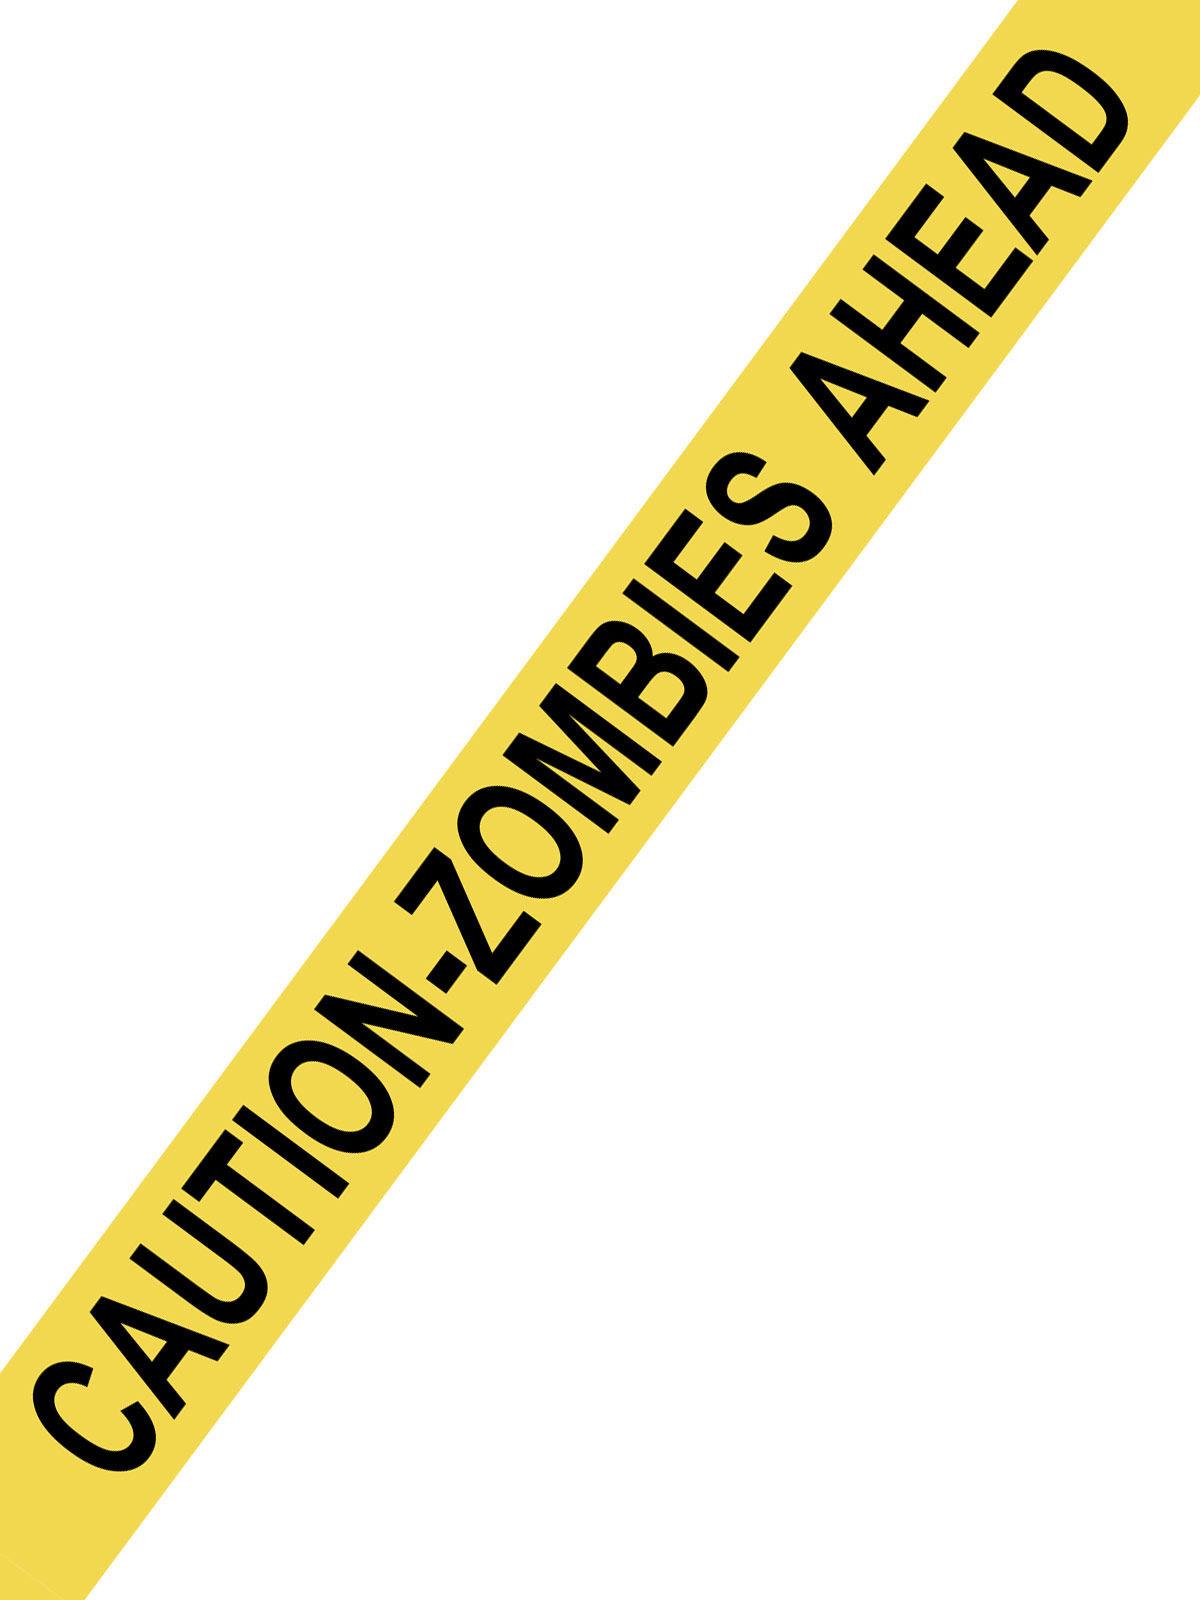 absperrband caution zombies ahead halloween party deko gelb schwarz 1500x8cm g nstige. Black Bedroom Furniture Sets. Home Design Ideas